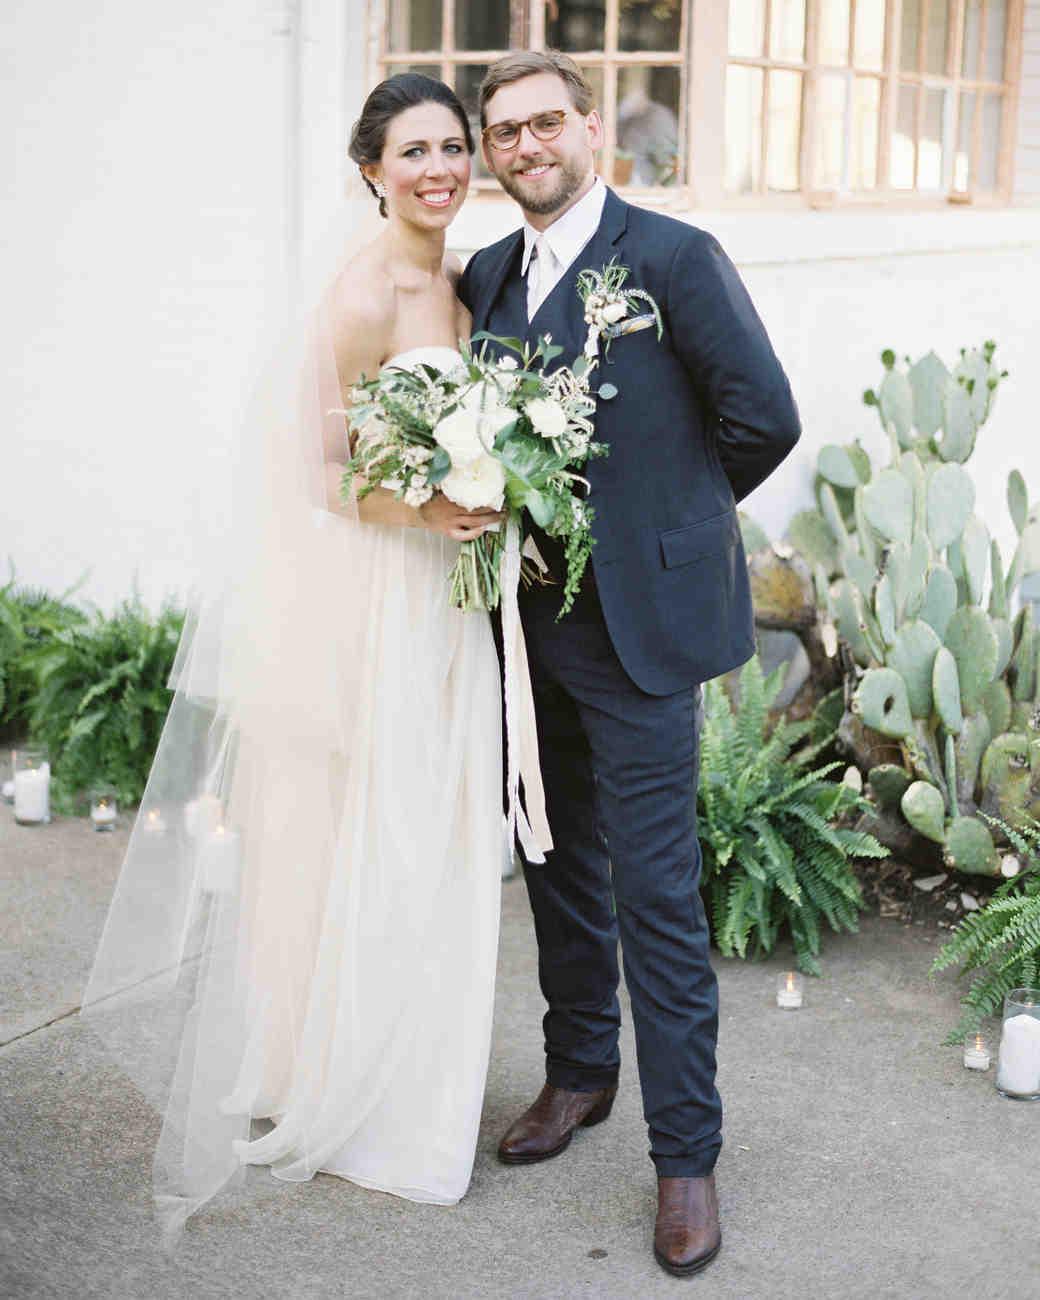 an intimate backyard wedding in oklahoma martha stewart weddings